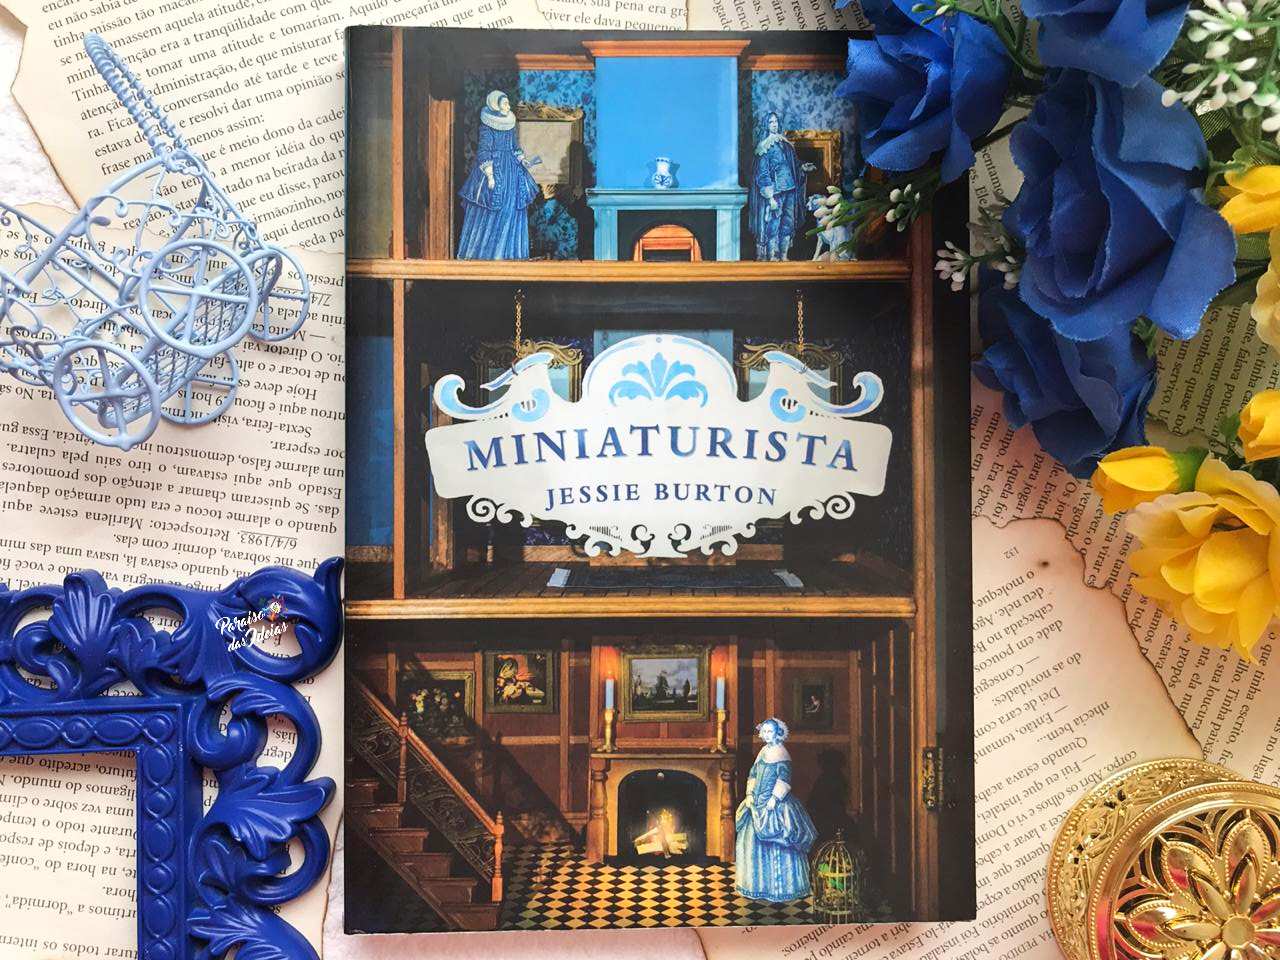 Miniaturista || Jessie Burton